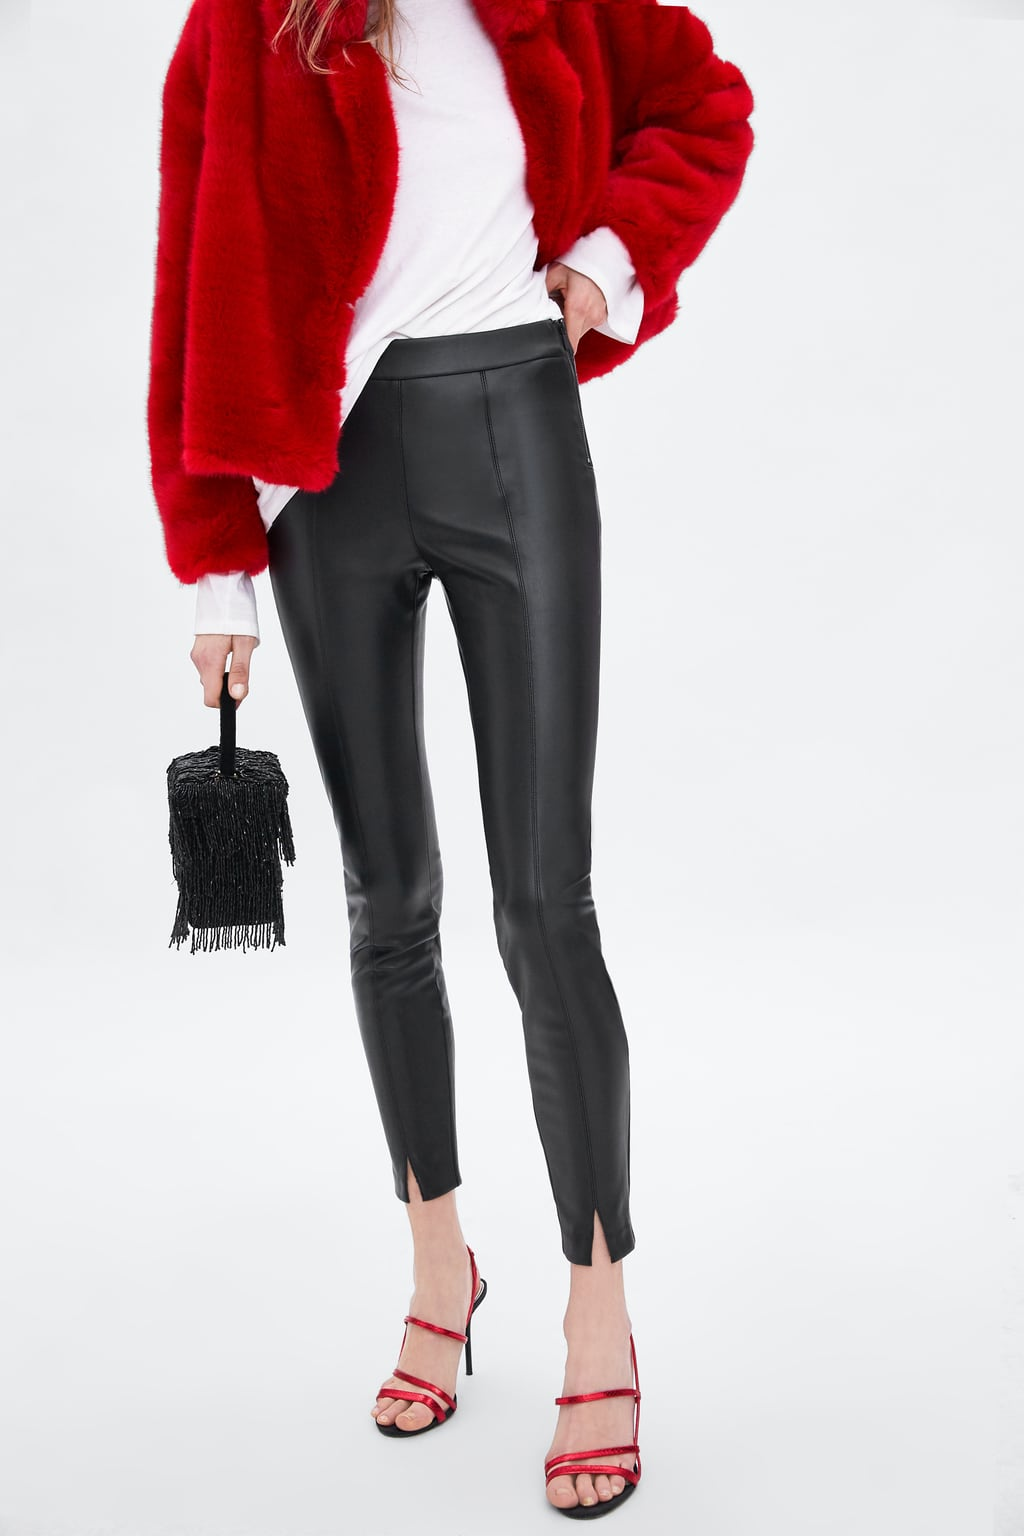 Zara Rules - #stradablogmx